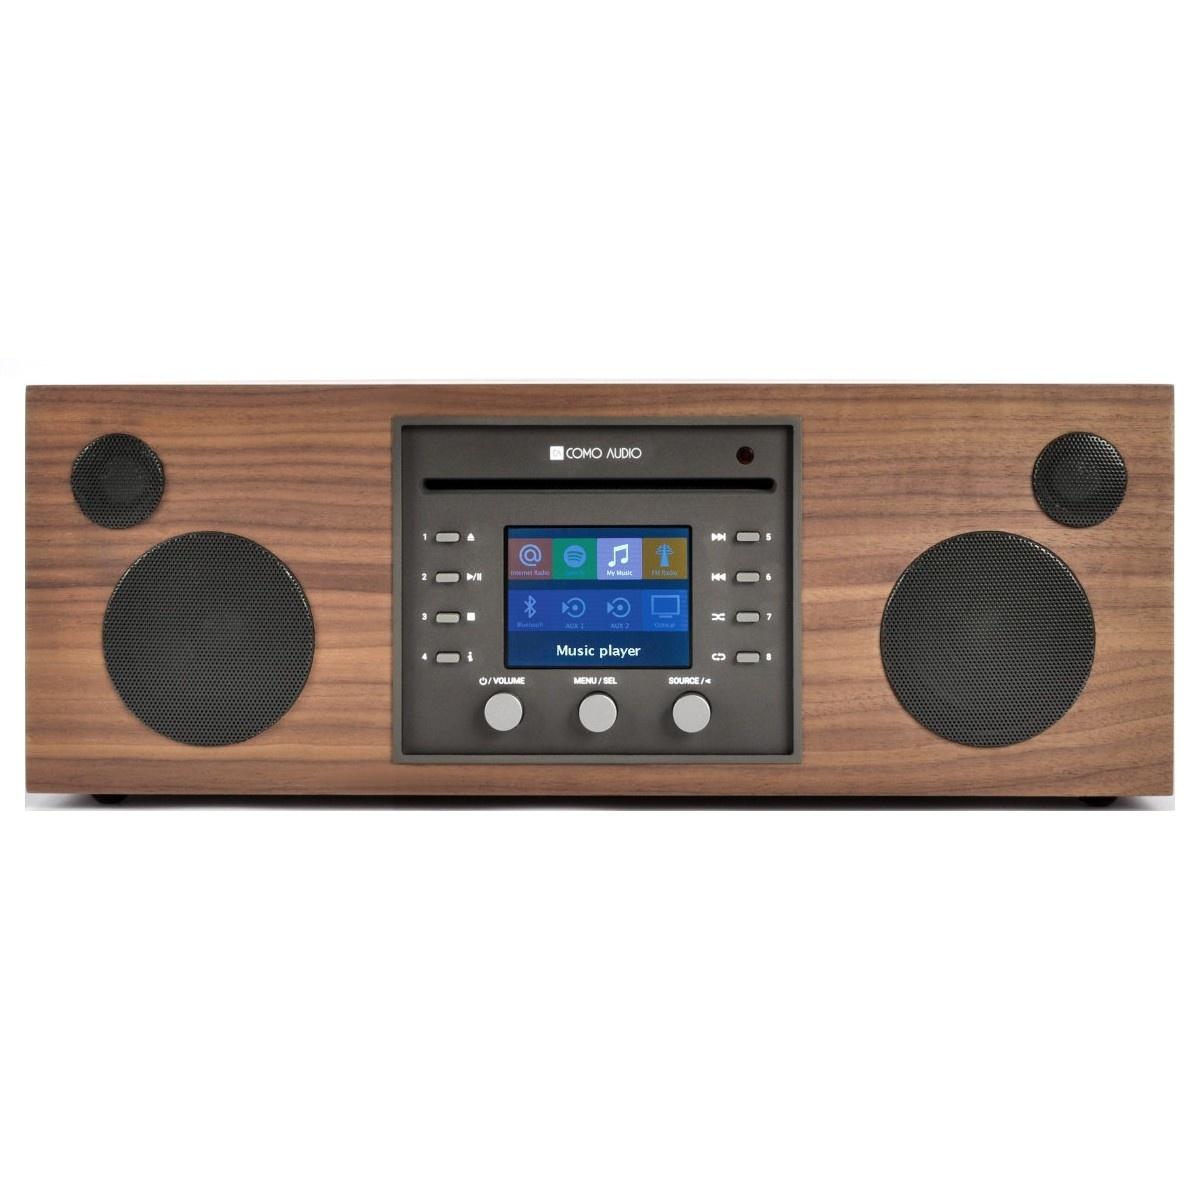 Como Audio Musica - DAB + / FM-radio met internetradio en CD-speler - Walnoot